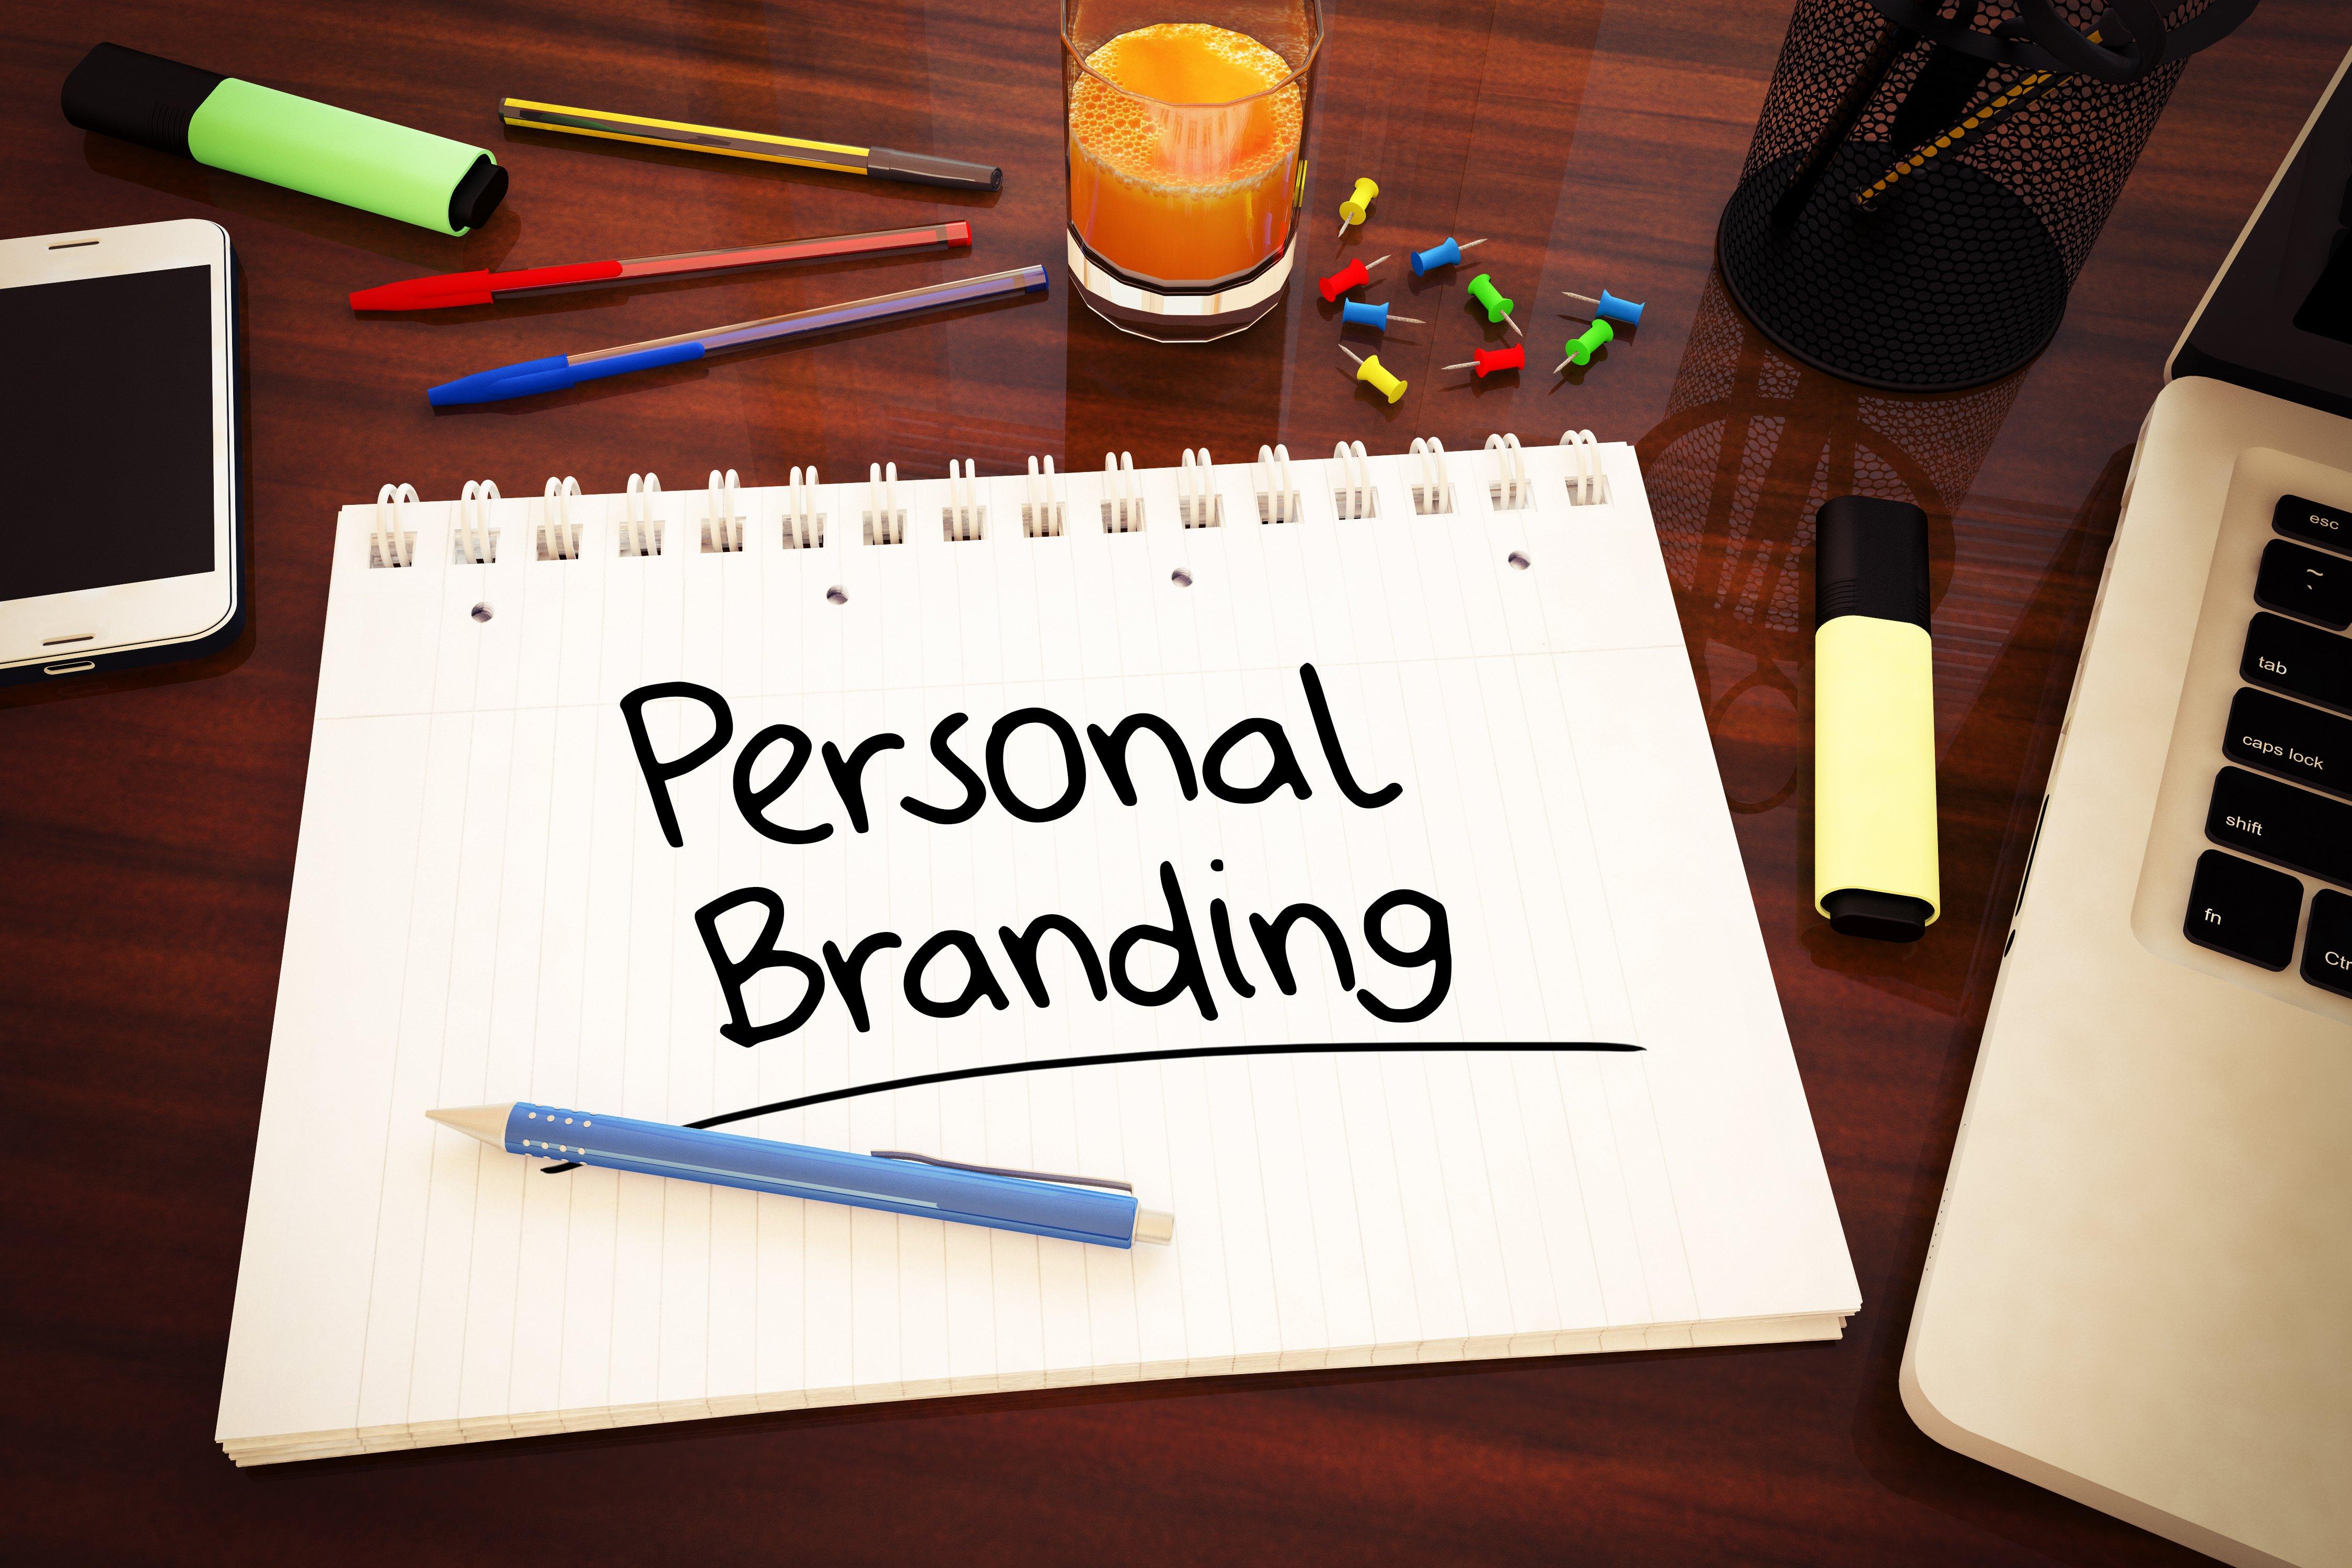 Tendencias de branding personal que deberías considerar para tus colaboradores